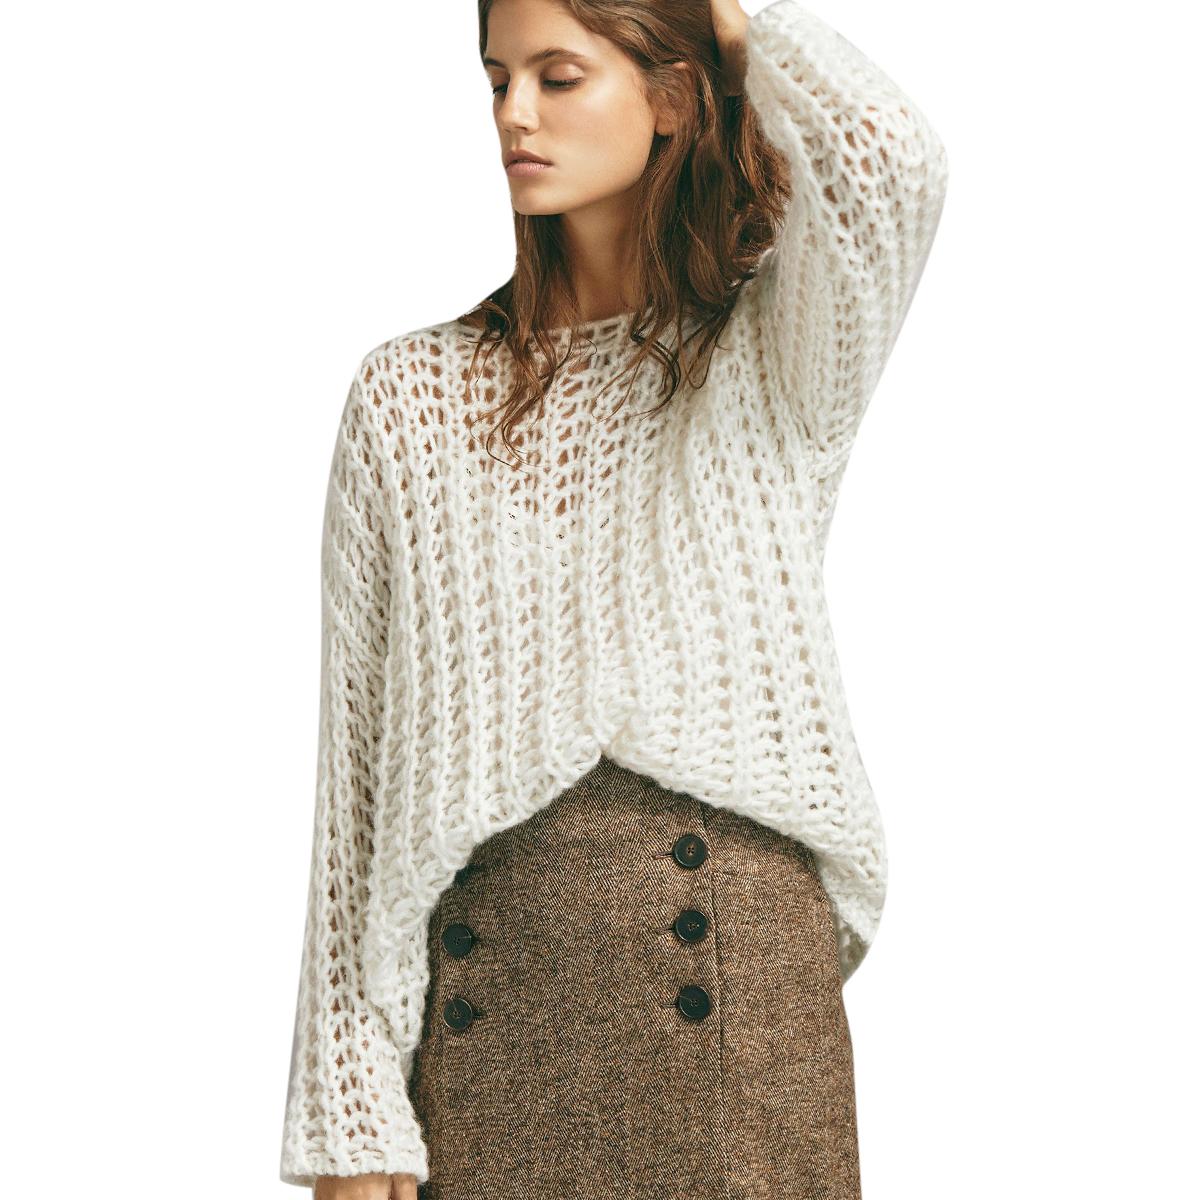 Massimo Dutti Textured open knit sweater